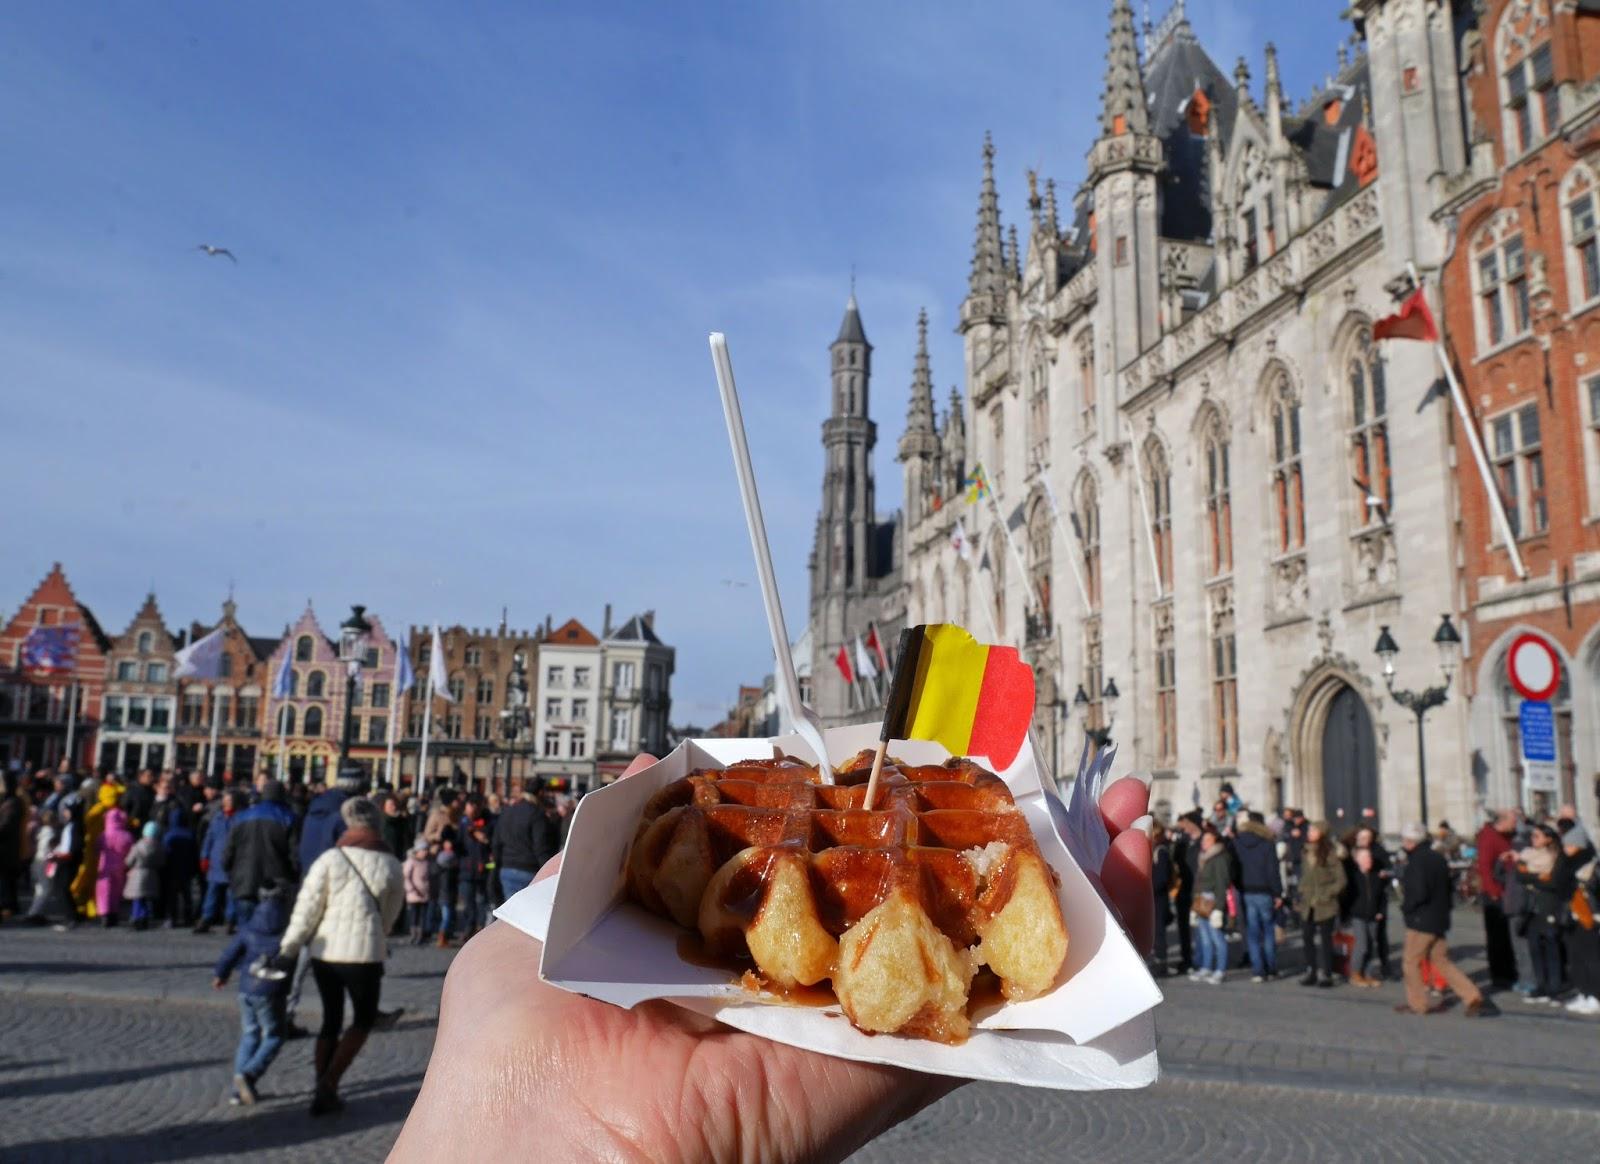 Waffles in Bruges Market Square, Belgium